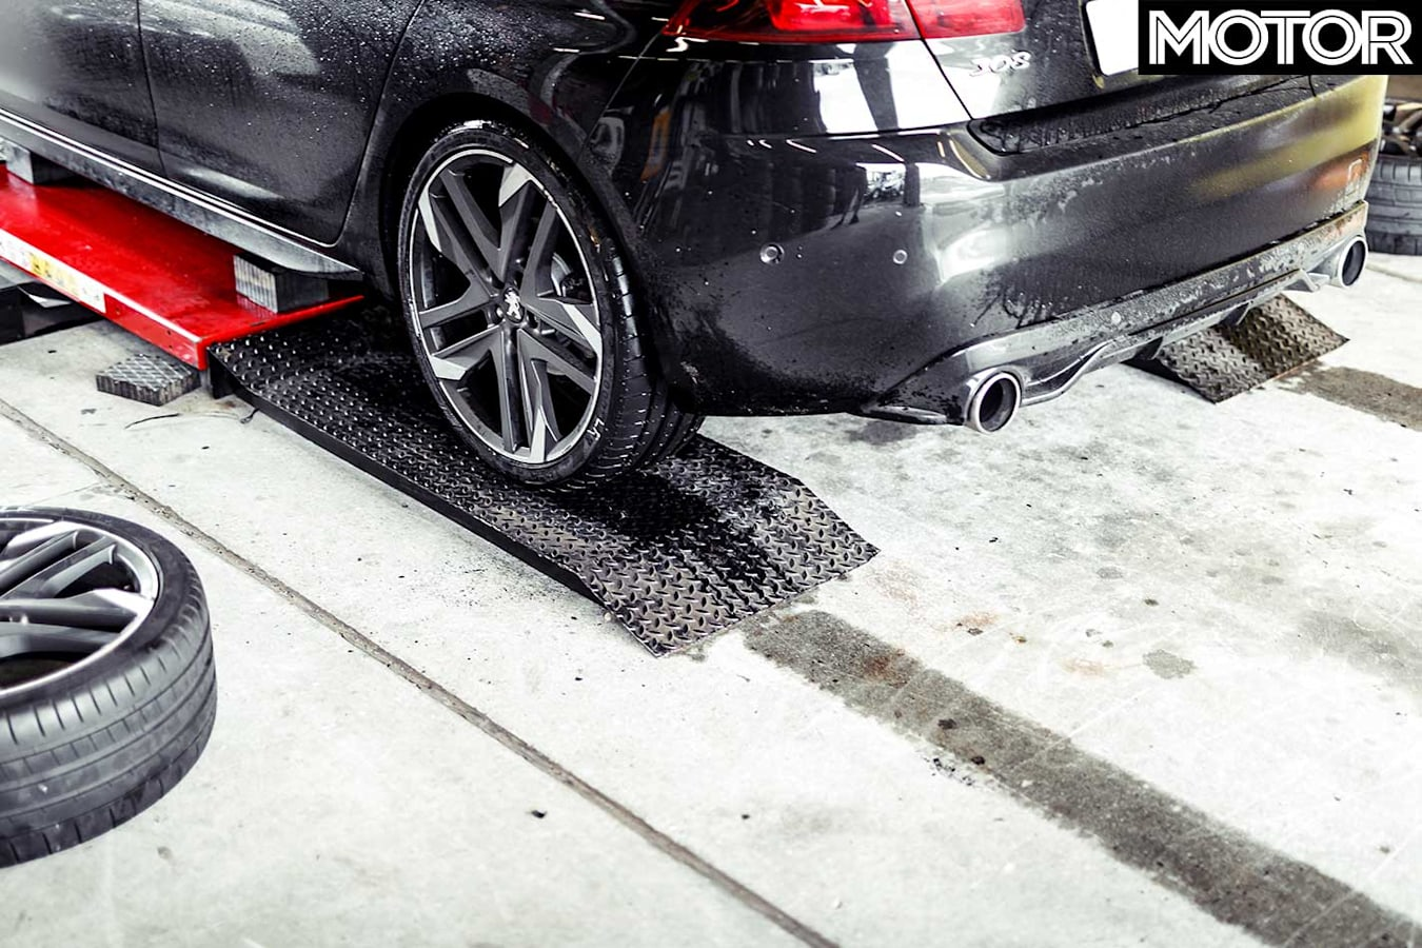 MOTOR-Tyre-Test-2019-testing-variables